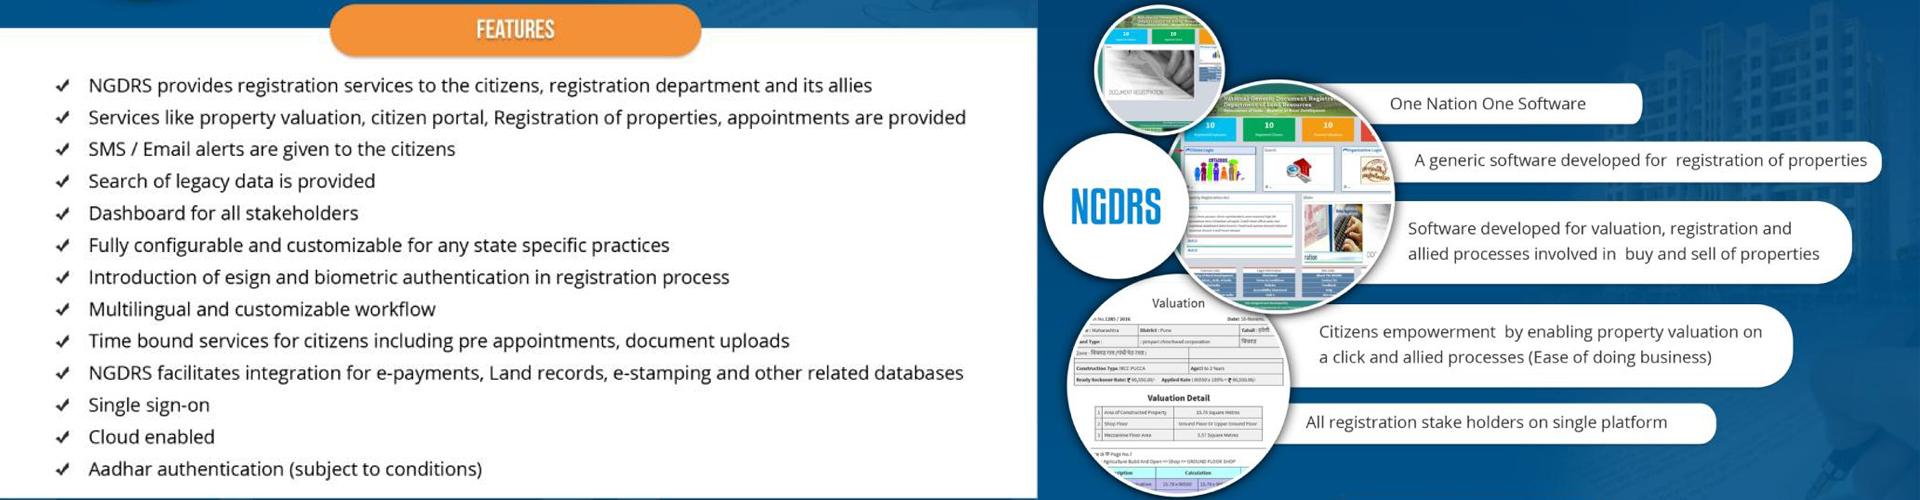 NGDRS : National Generic Document Registration System